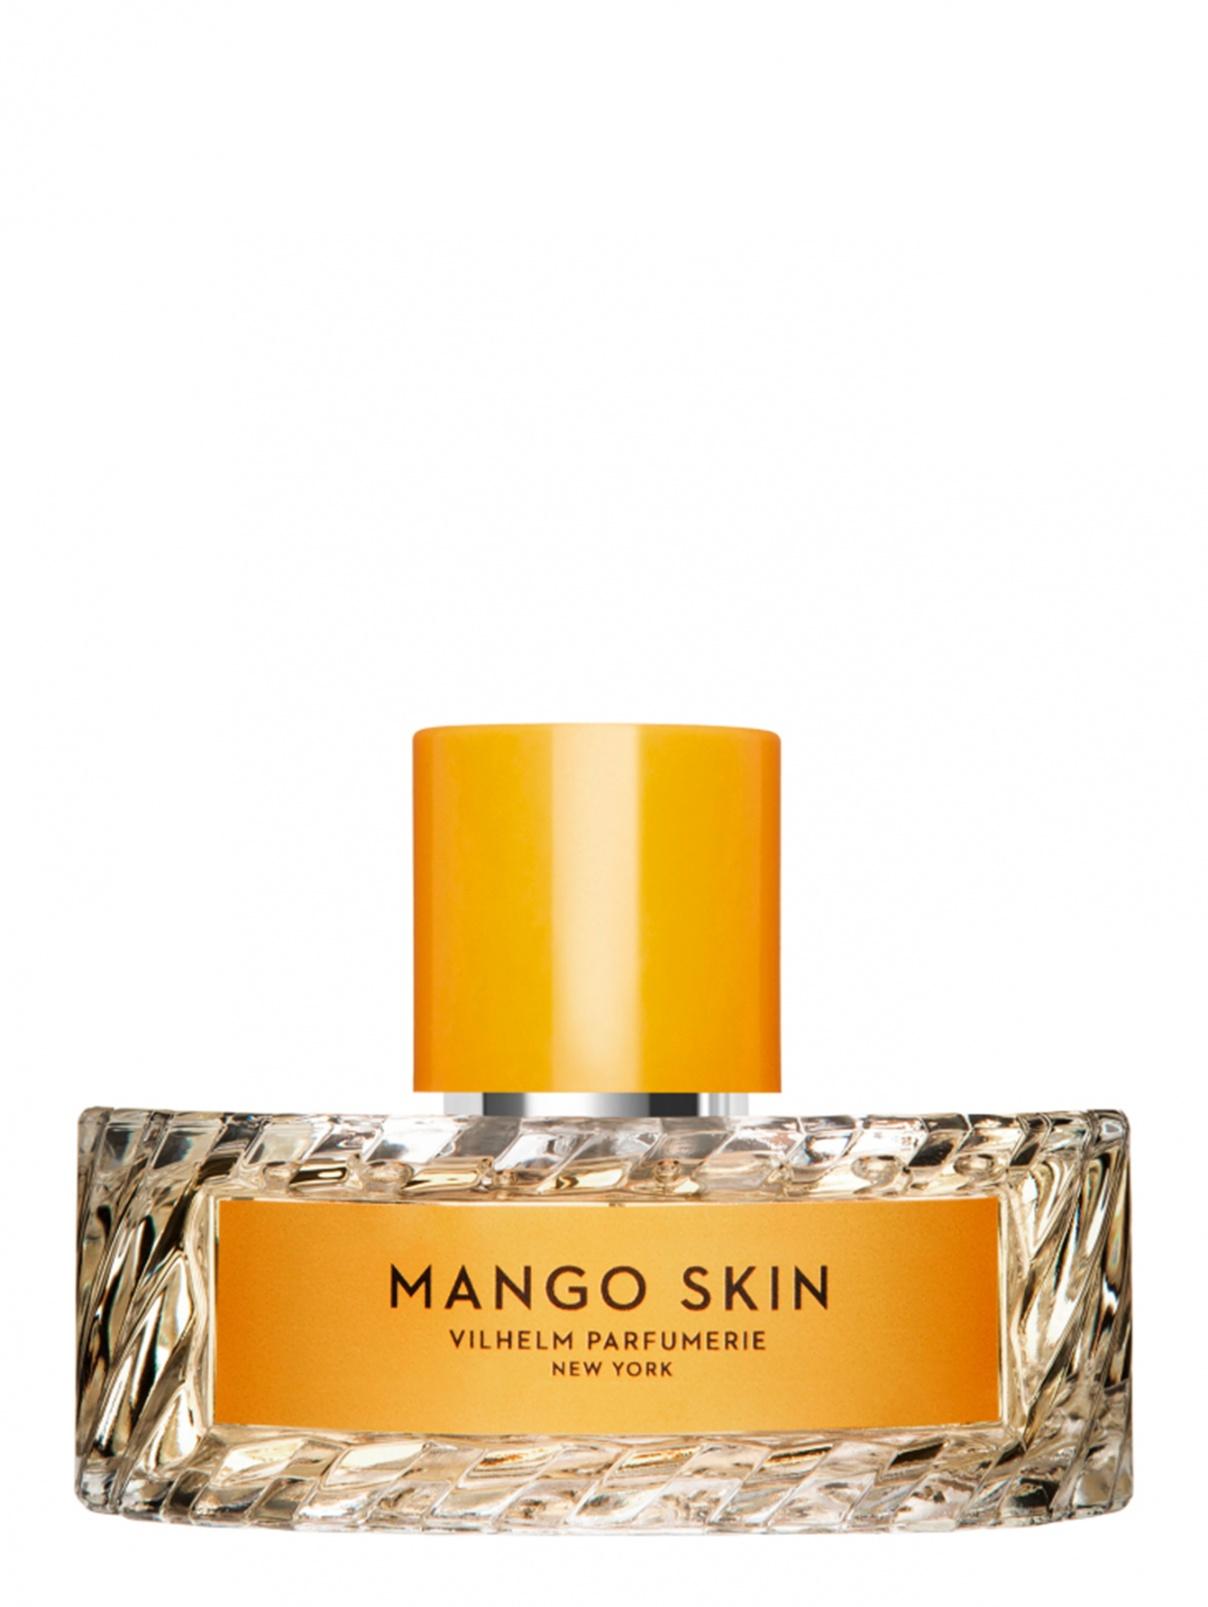 Парфюмерная вода Mango Skin 100 мл Vilhelm Parfumerie  –  Общий вид